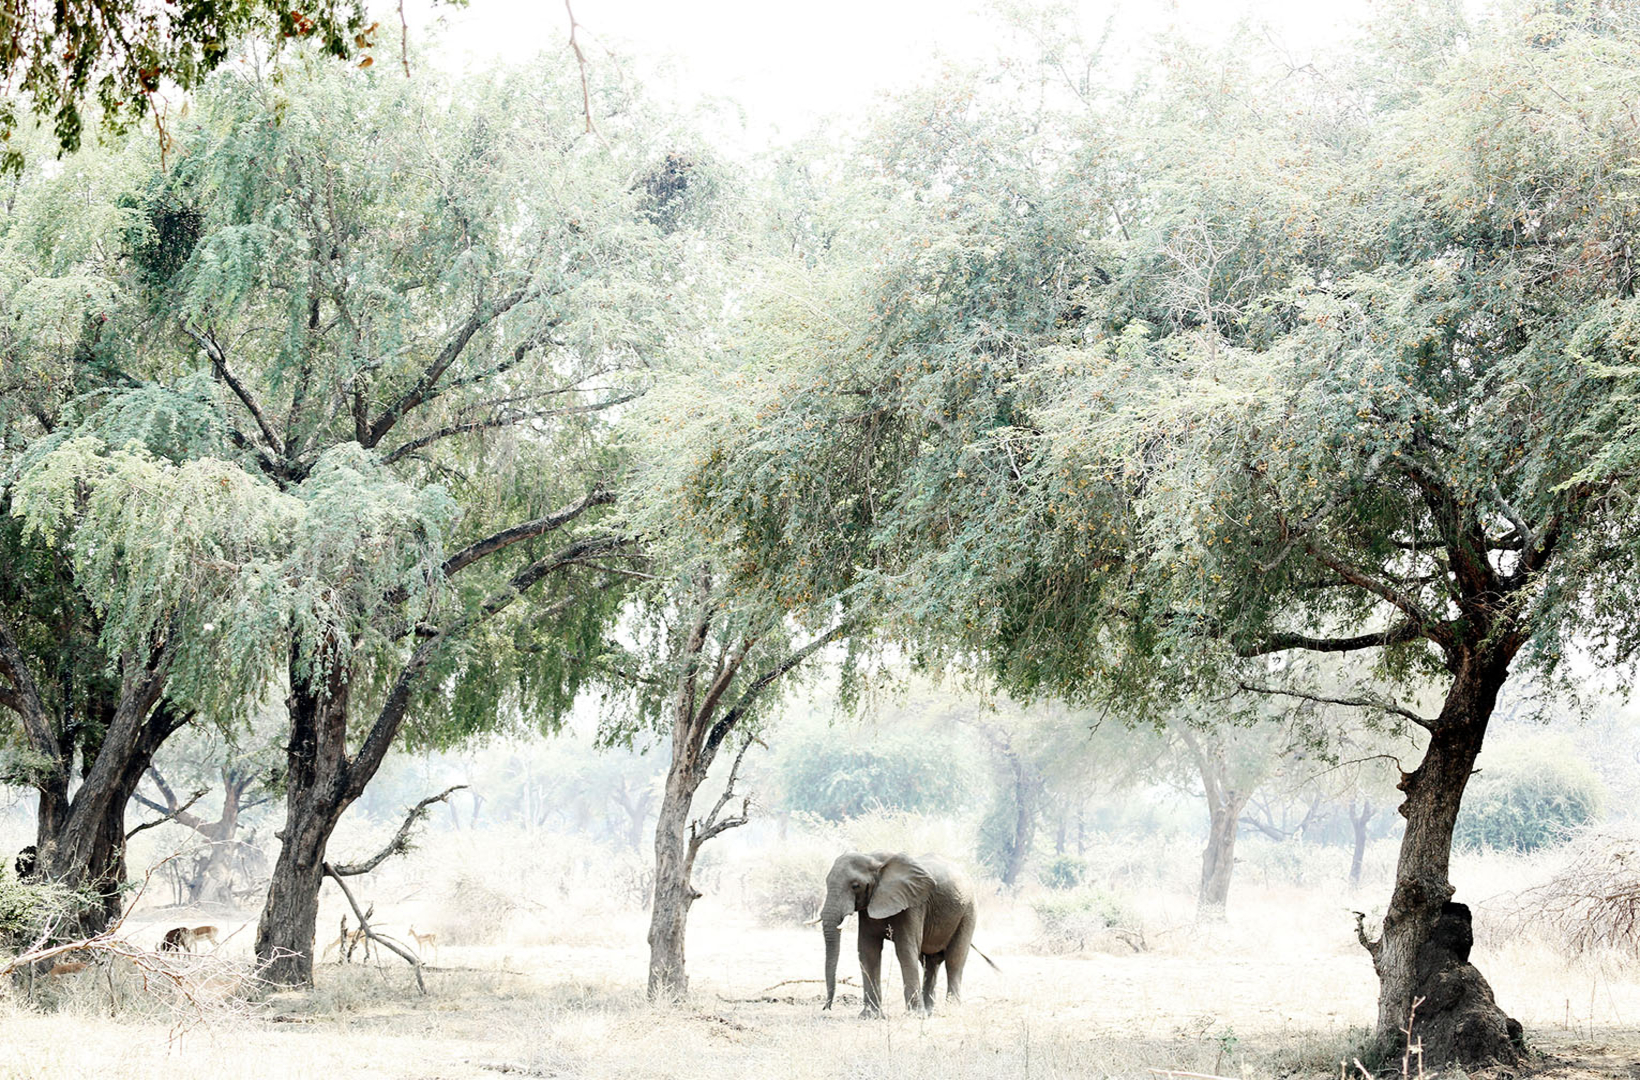 Lone African elephant idles in the shade of an Albida Fibida Acacia tree in Mana Pools National Park Zimbabwe